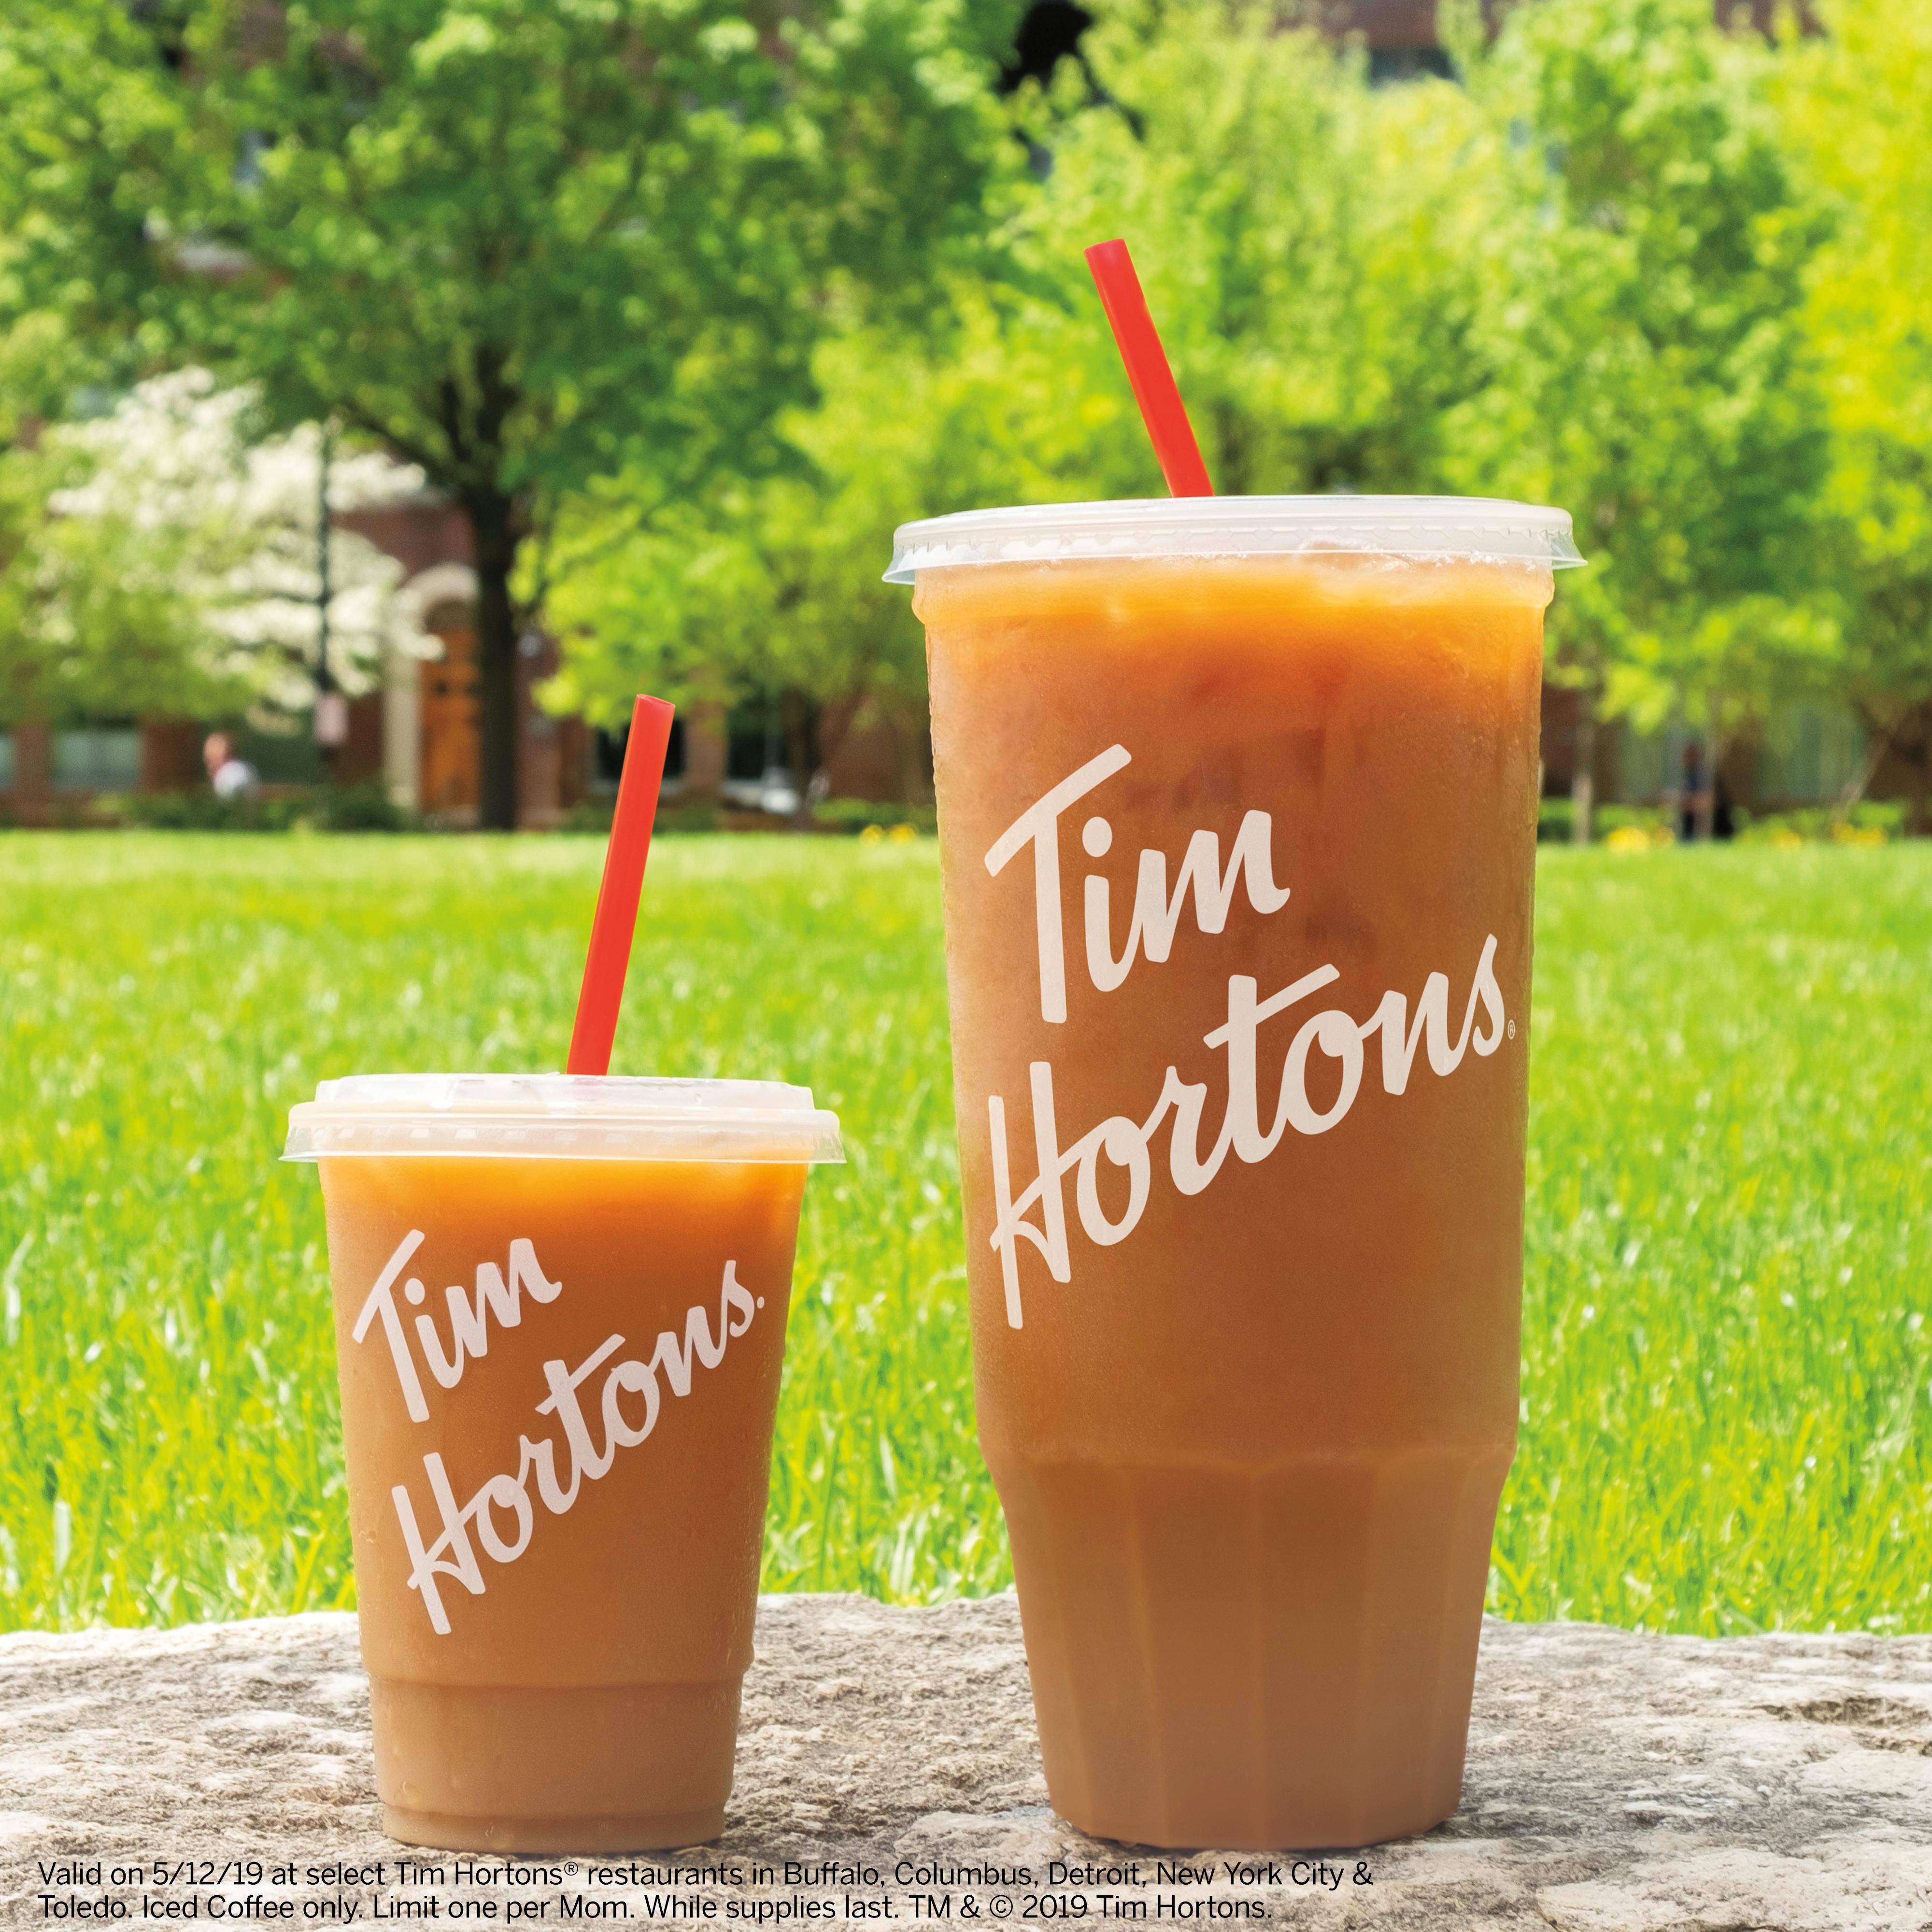 U.S. Introduces Mom-Sized Iced Coffee